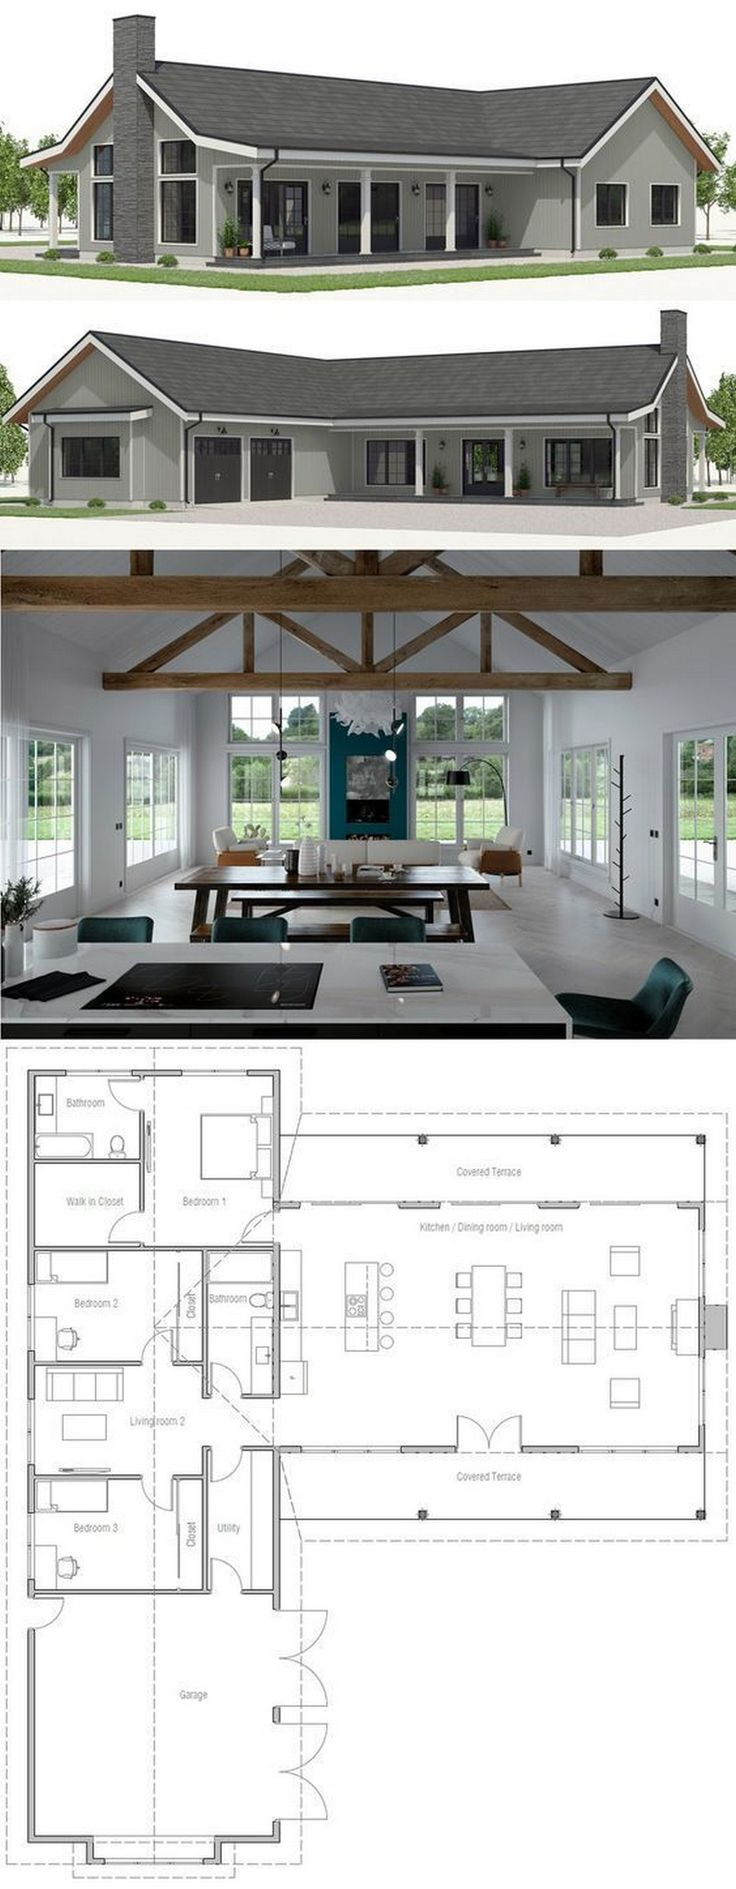 37 Architectural Designs Modern Farmhouse Plan